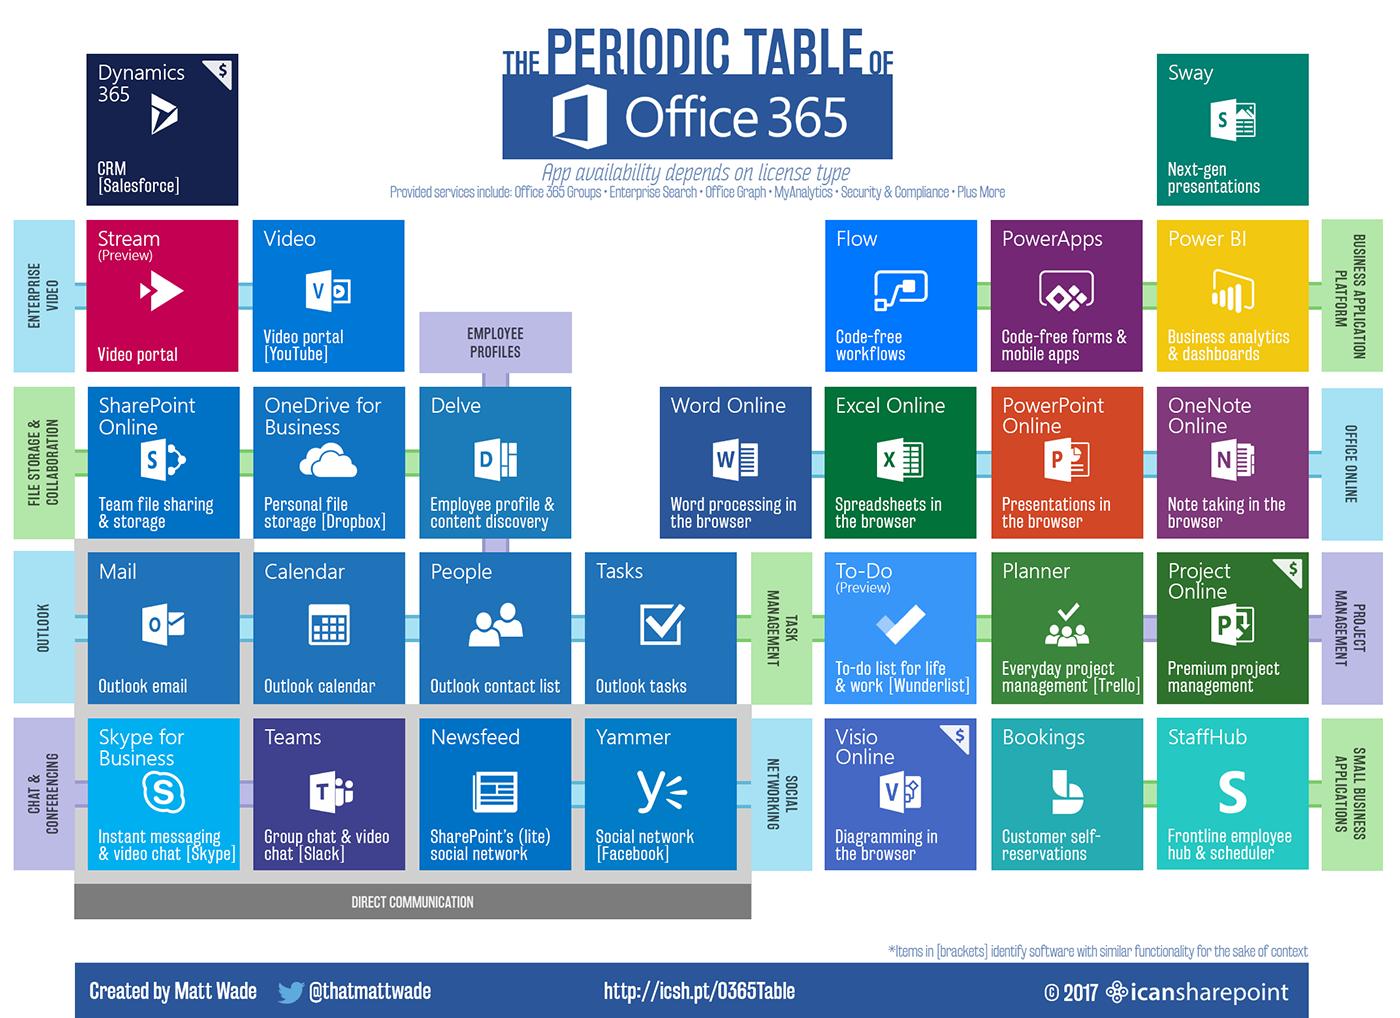 Periodic table of office 365 1400px john yassas blog periodic table of office 365 1400px gamestrikefo Gallery